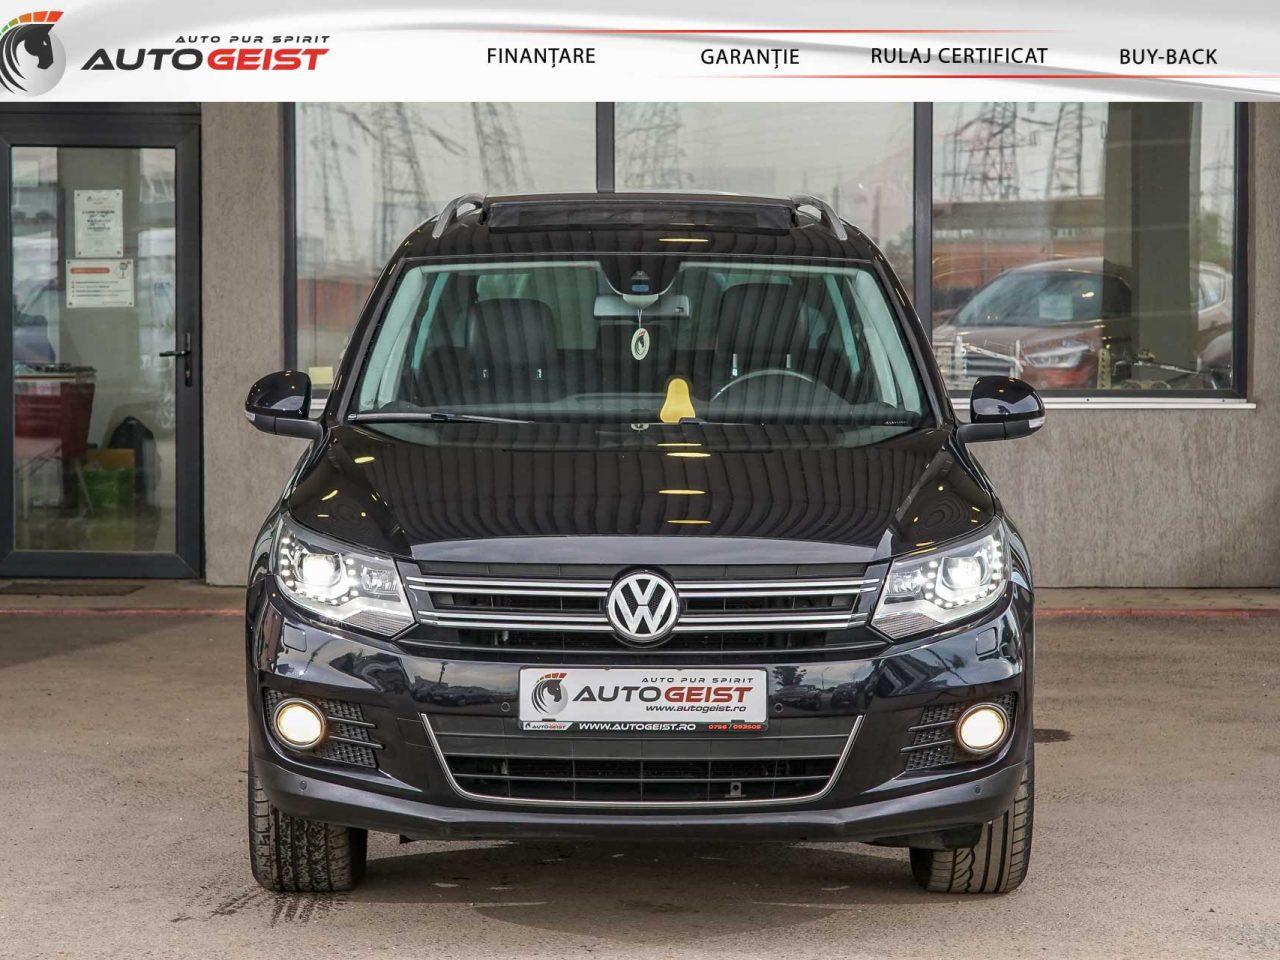 volkswagen-tiguan-4motion-dsg-panoramic-01217